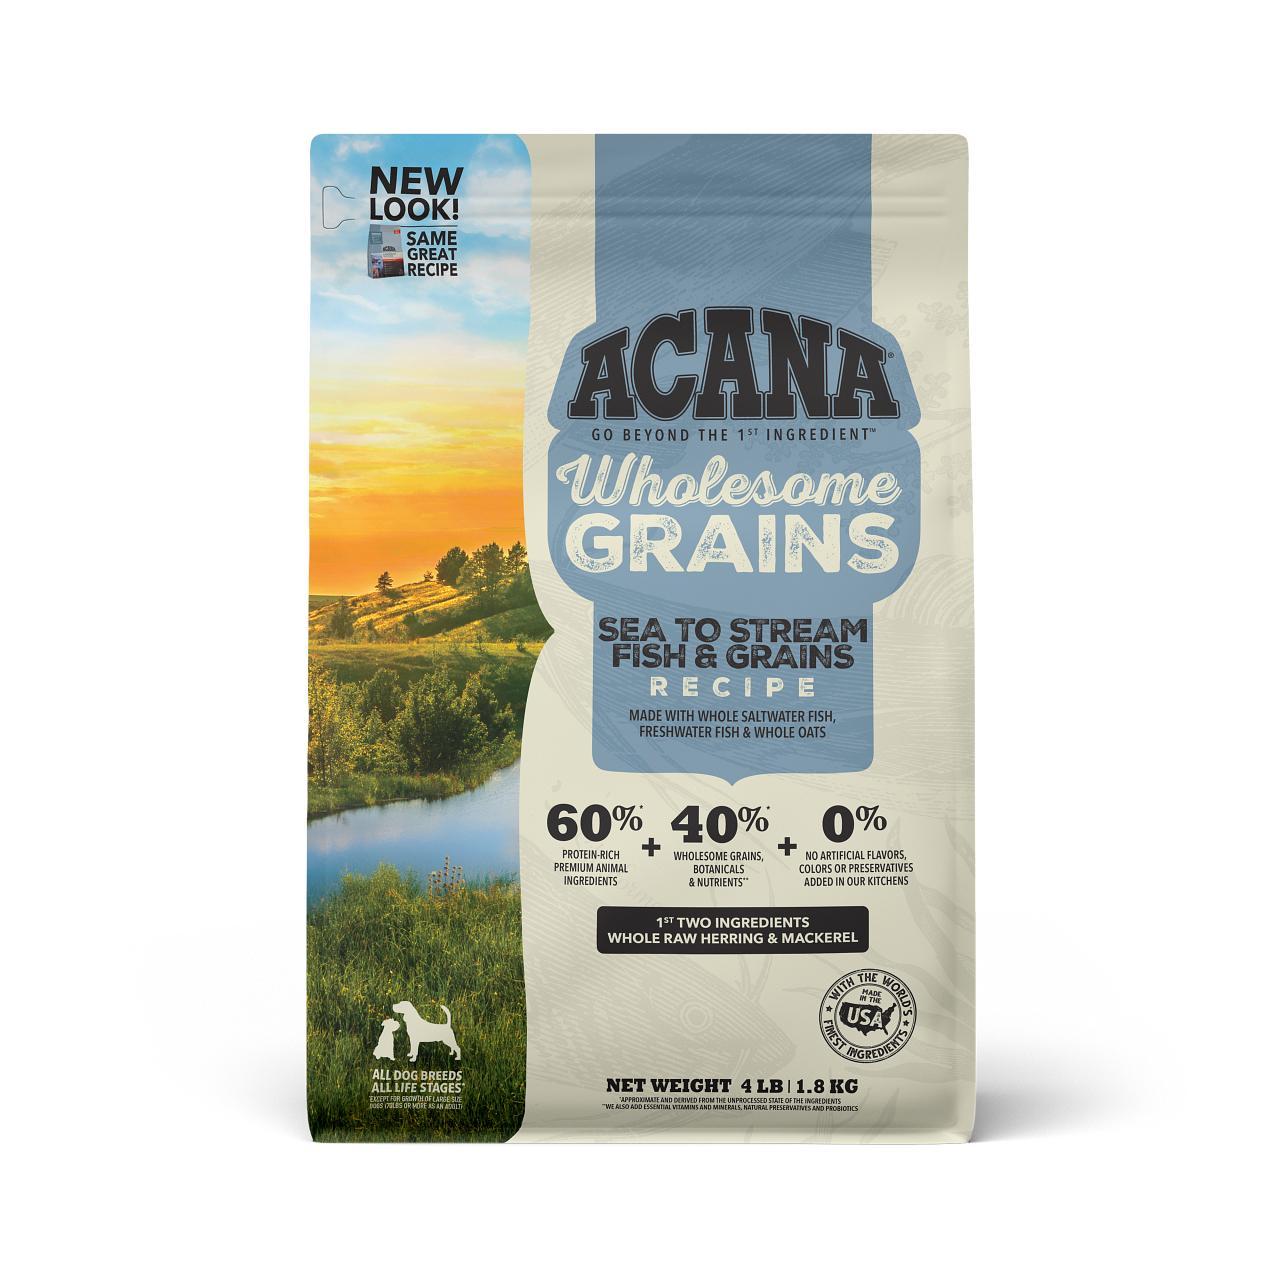 ACANA Wholesome Grains Sea to Stream Recipe Dry Dog Food, 4-lb